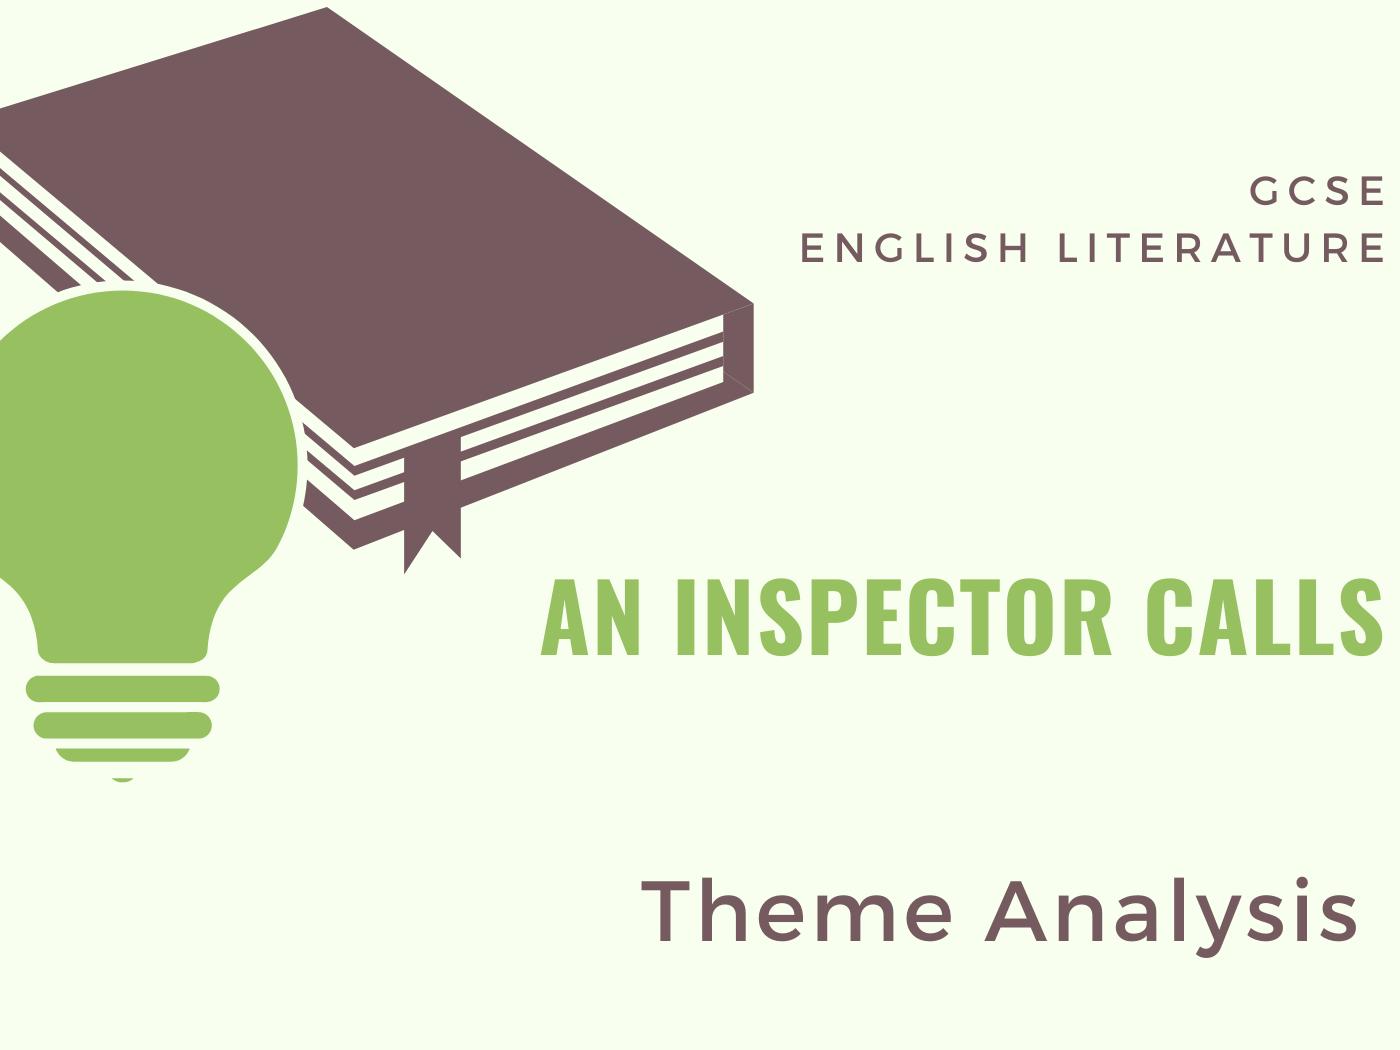 An Inspector Calls - Theme Analysis